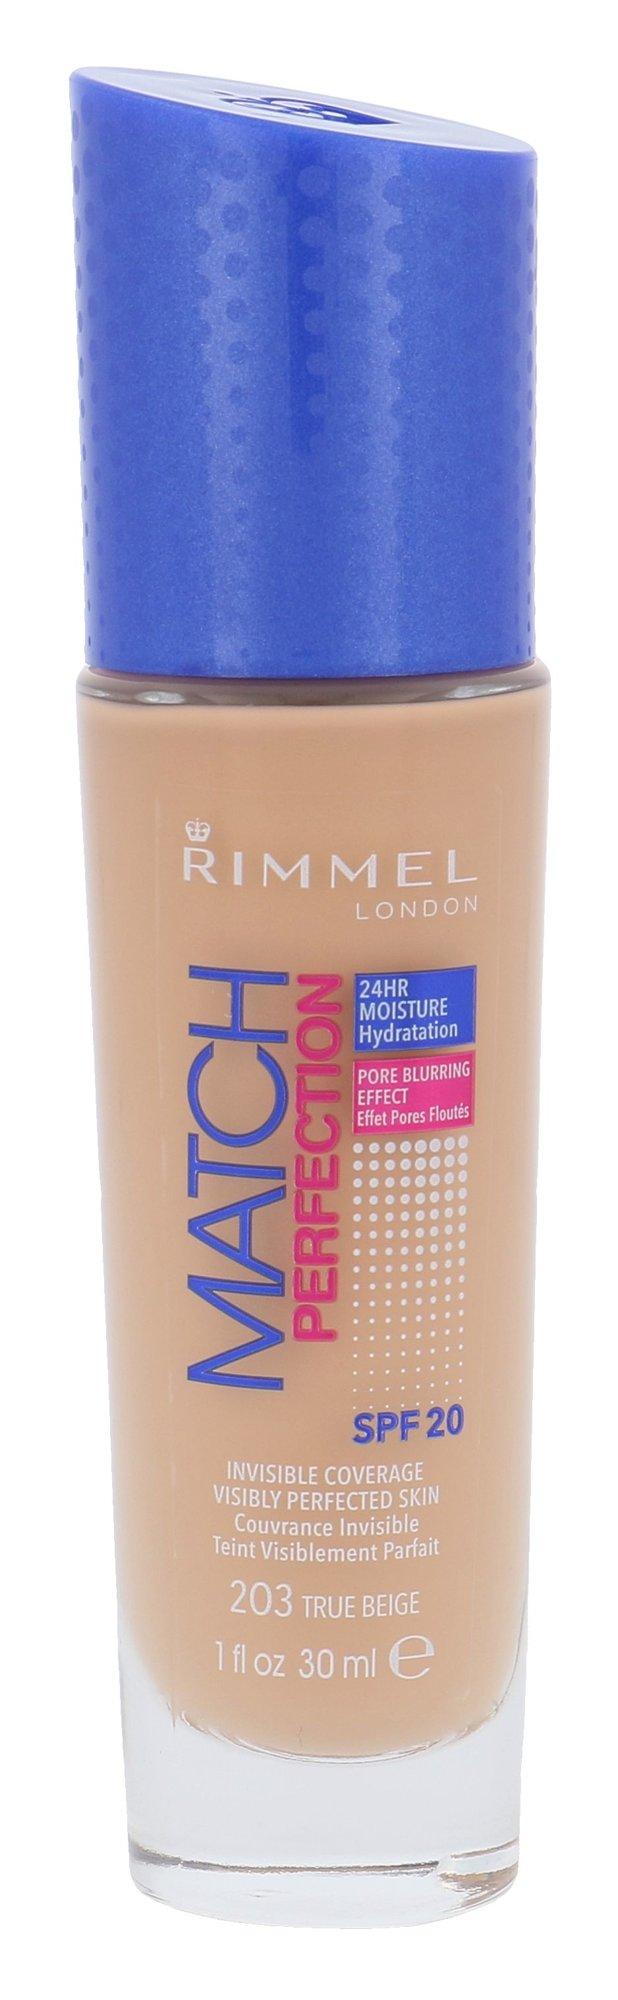 Rimmel London Match Perfection Cosmetic 30ml 203 True Beige